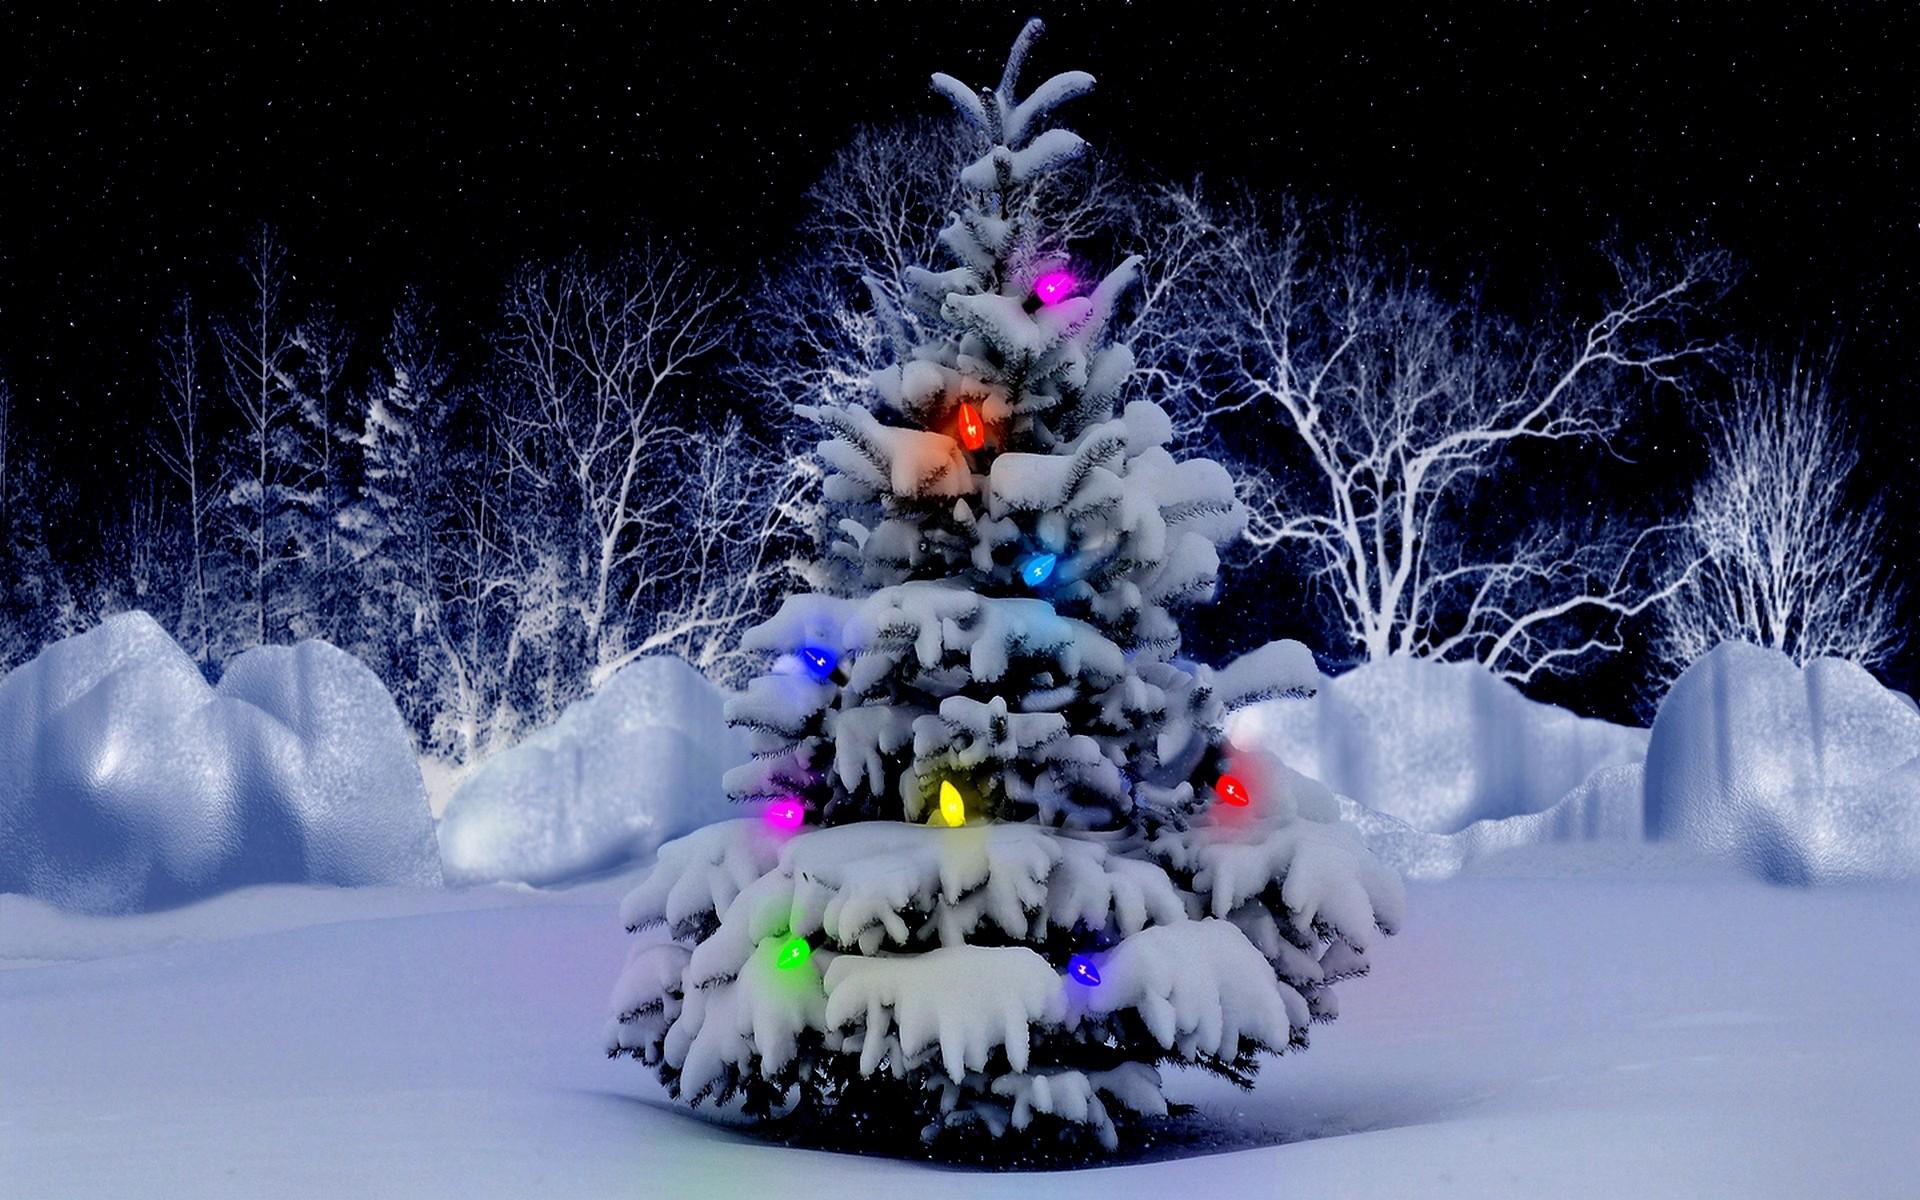 Christmas Tree Wallpaper HD Desktop 1138 – HD Wallpapers Site